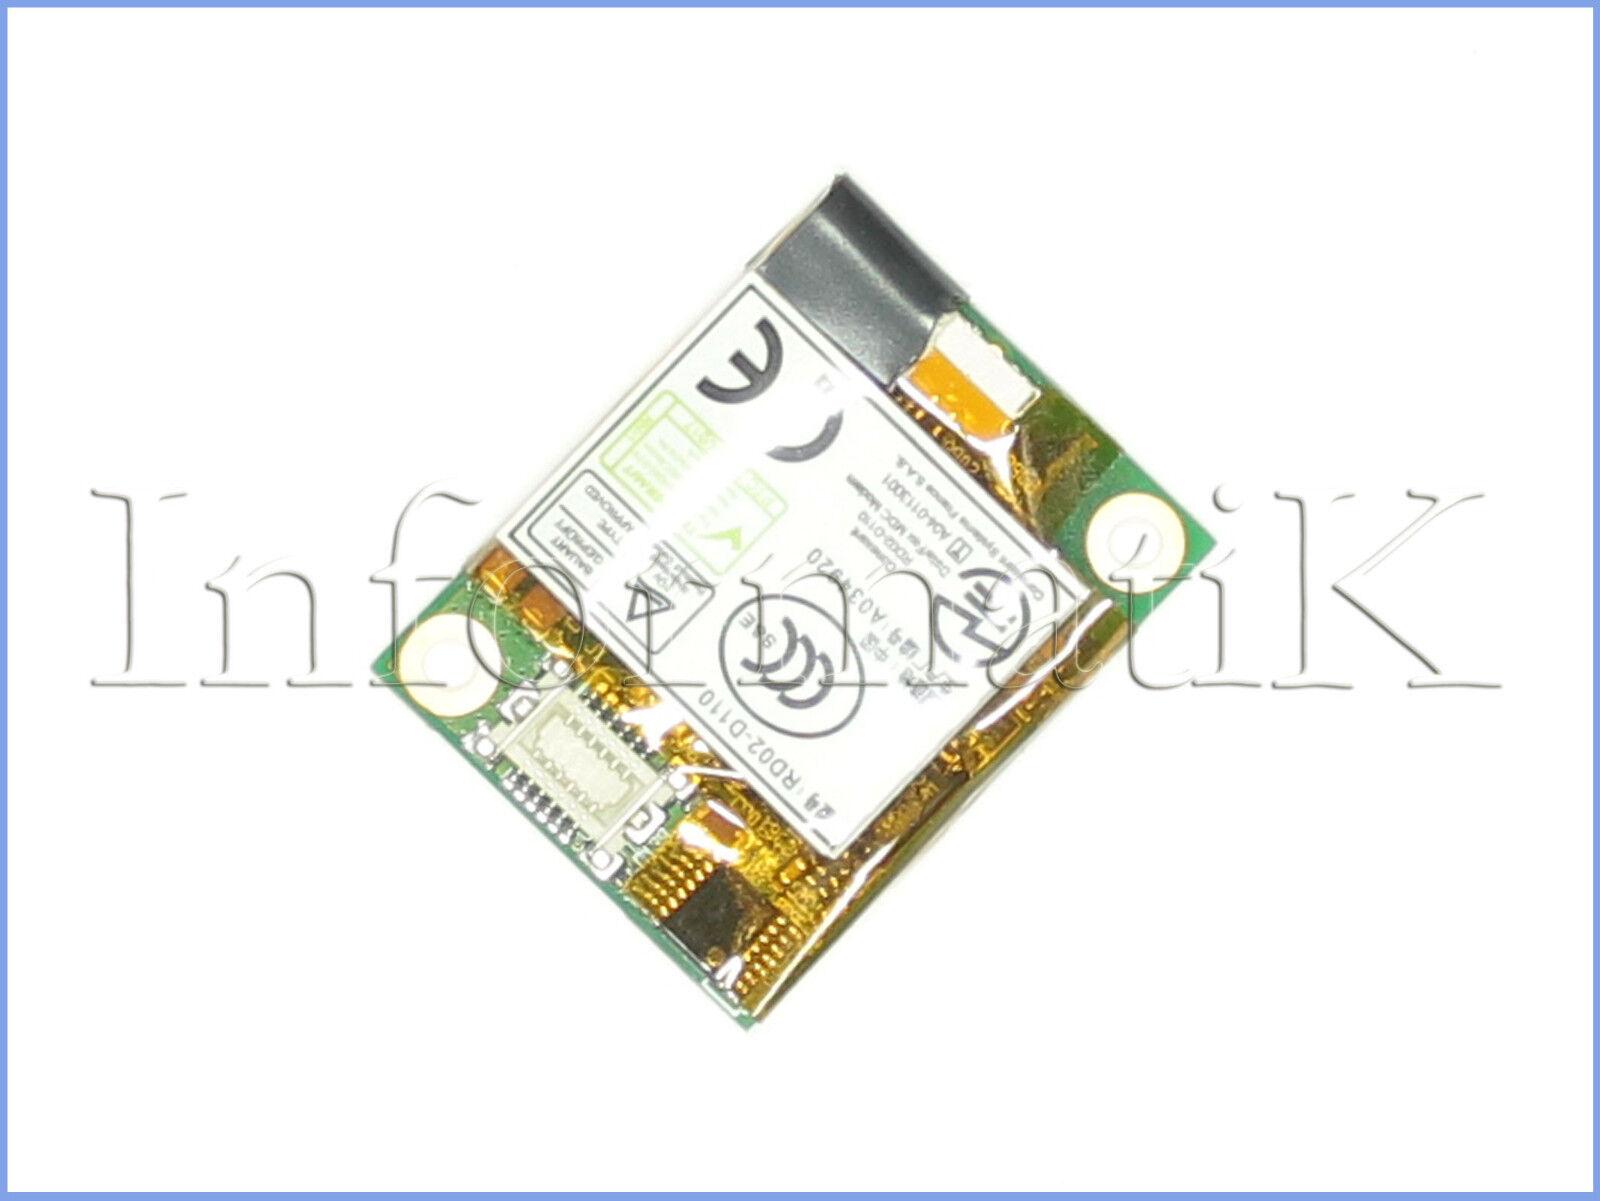 Sony Vaio VGN-S4XP PCG-6G1M Scheda Modem Board T60M845.04 LF